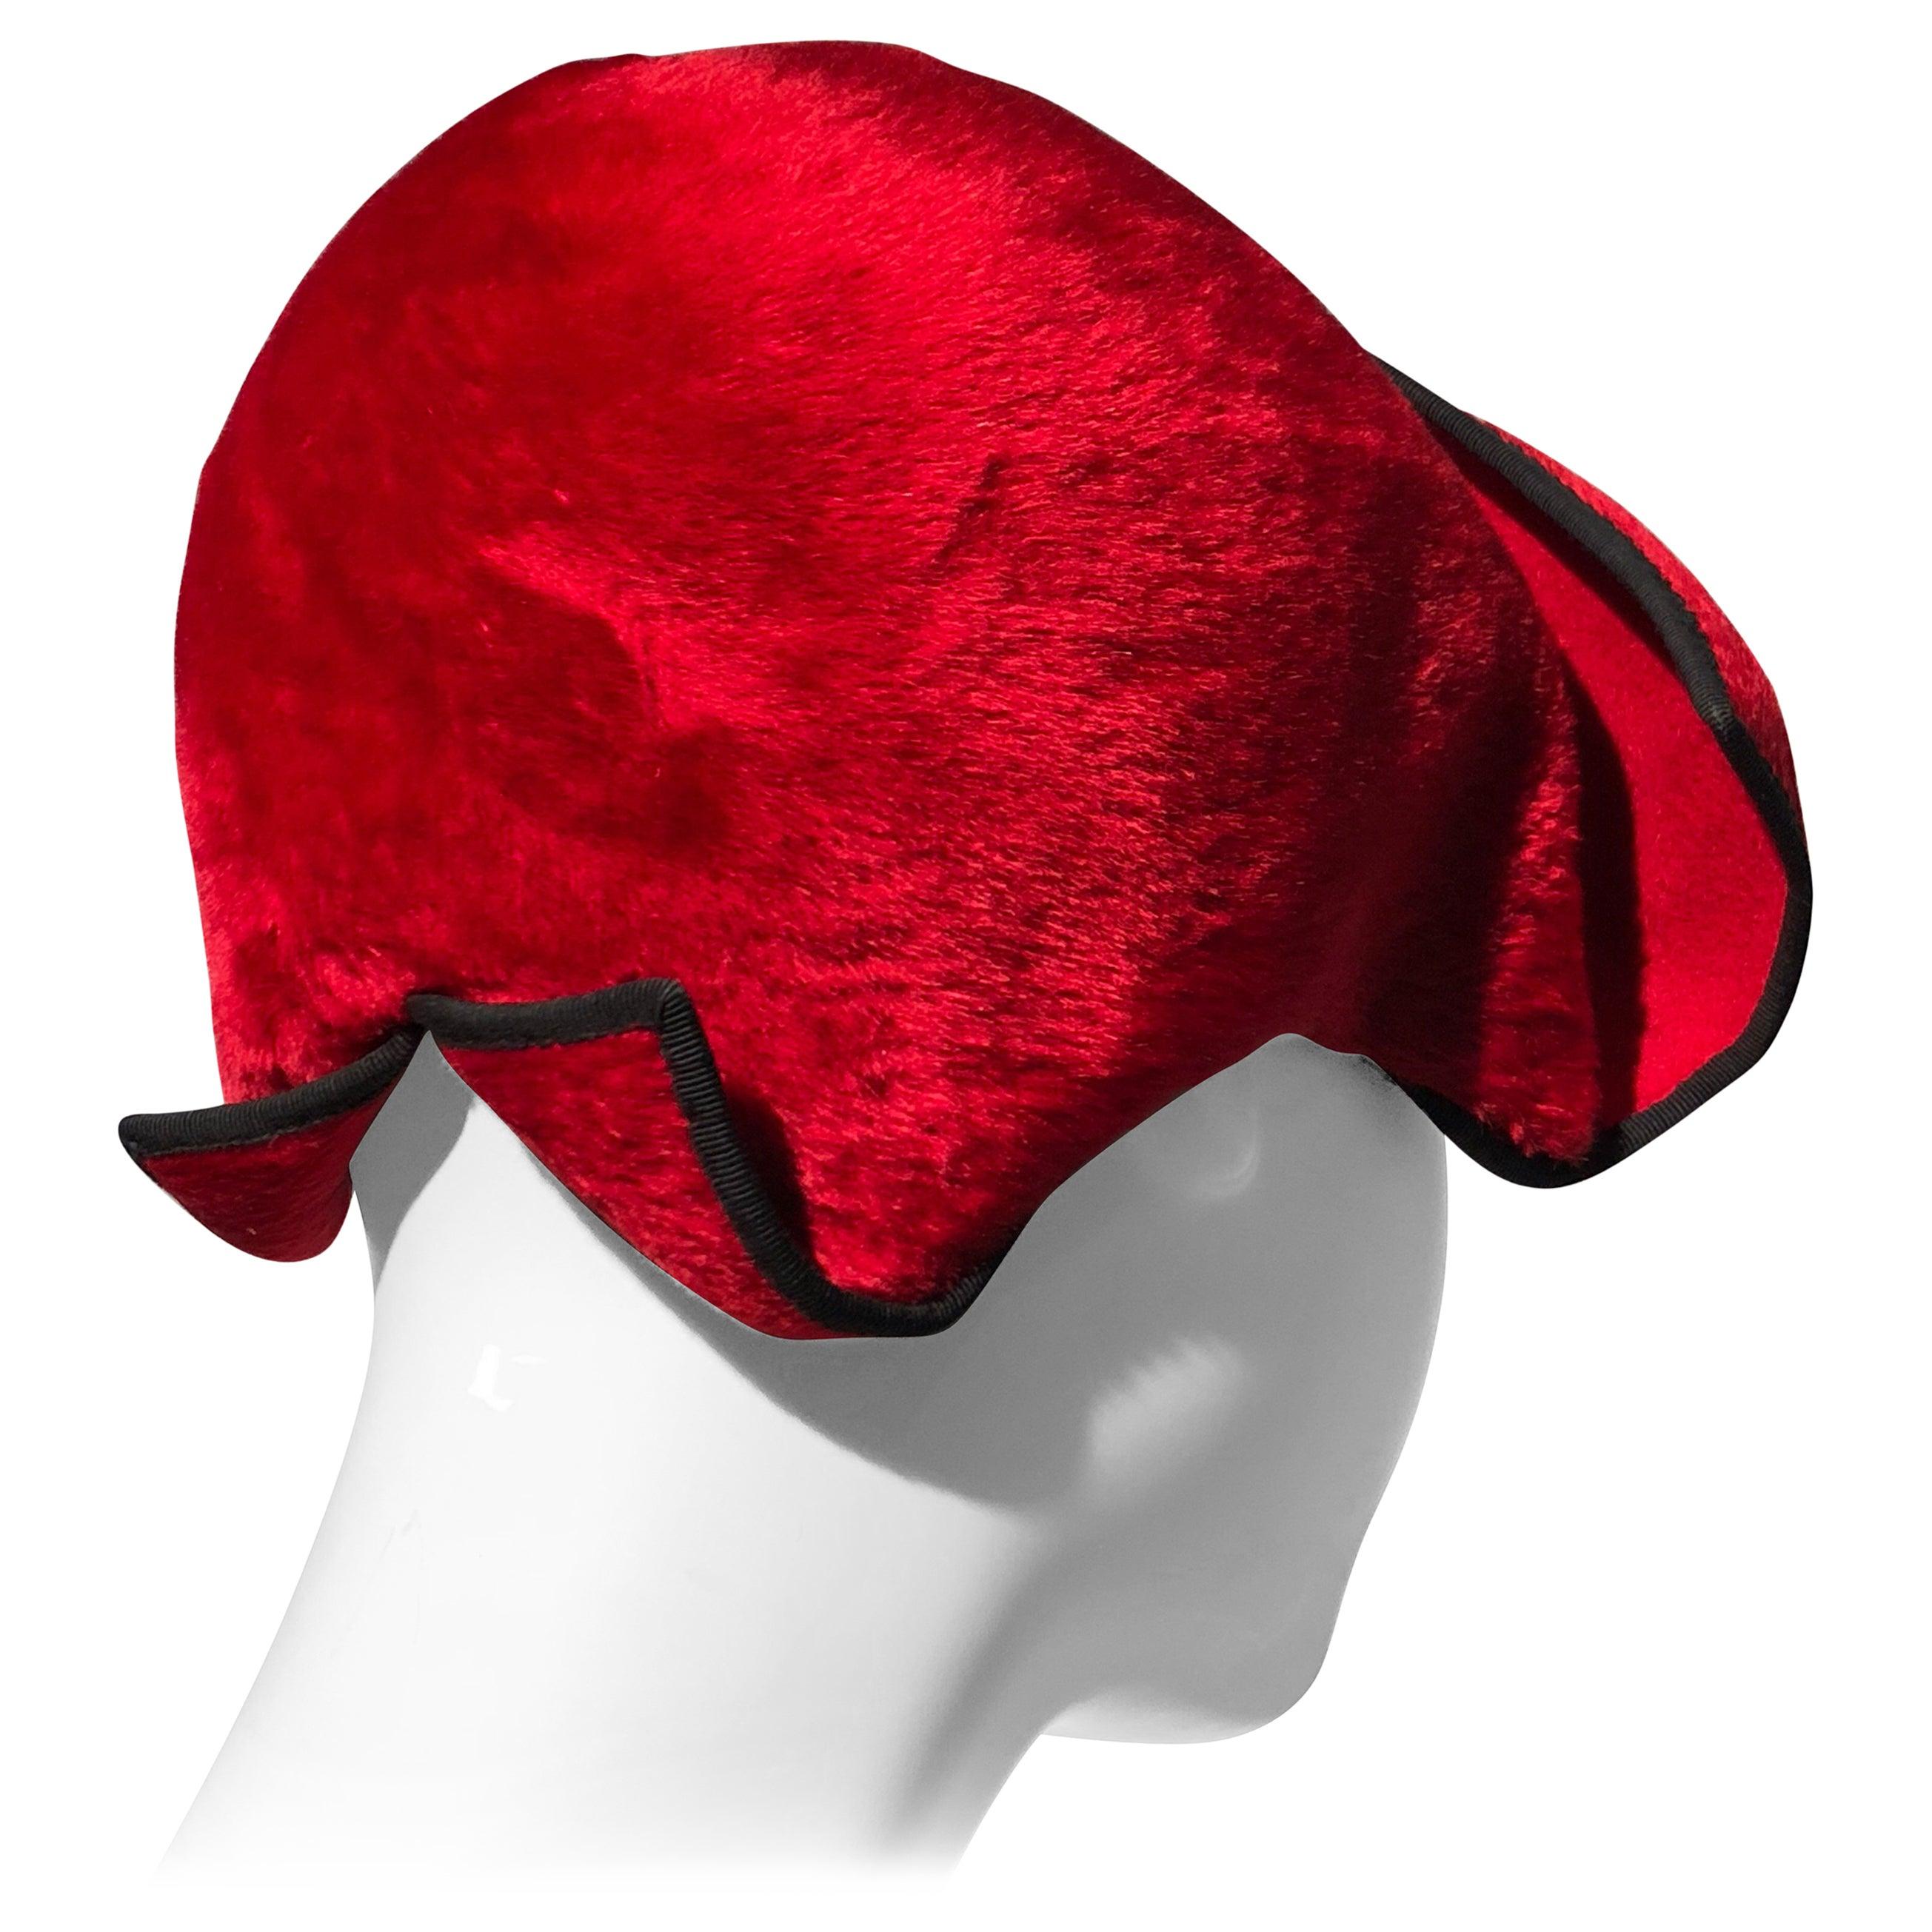 1950s John Frederics Cardinal Red Fur Felt Cloche Hat W/ Black Trim